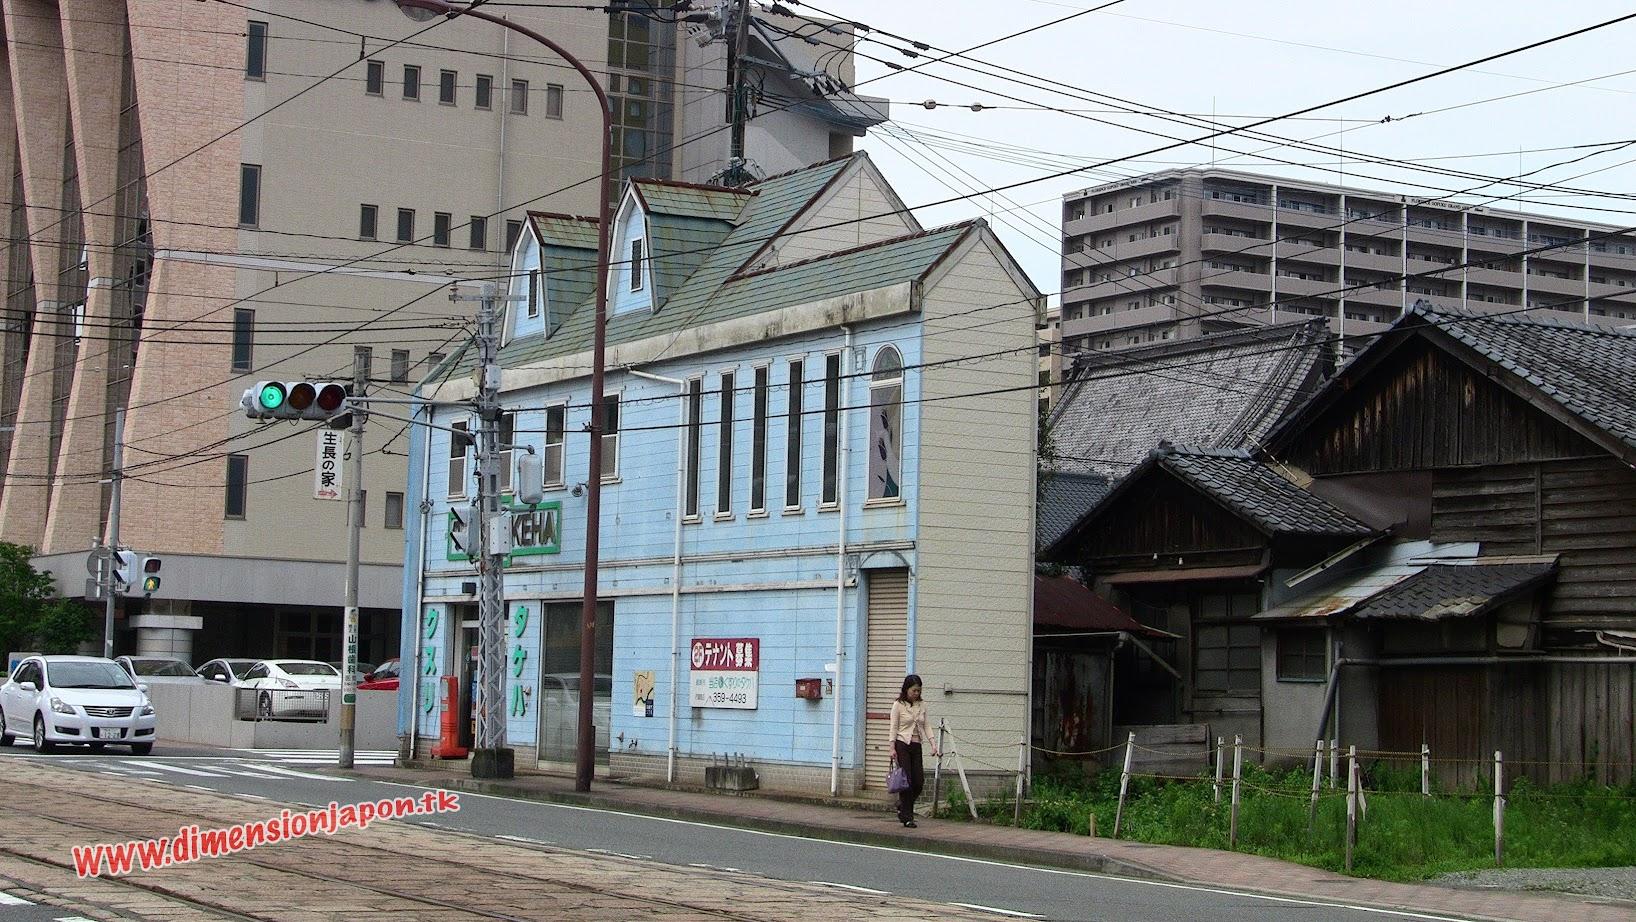 IMG_0566 Casa estrecha en Kumamoto, de paseo hacia el castillo  (Kumamoto) 15-07-2010